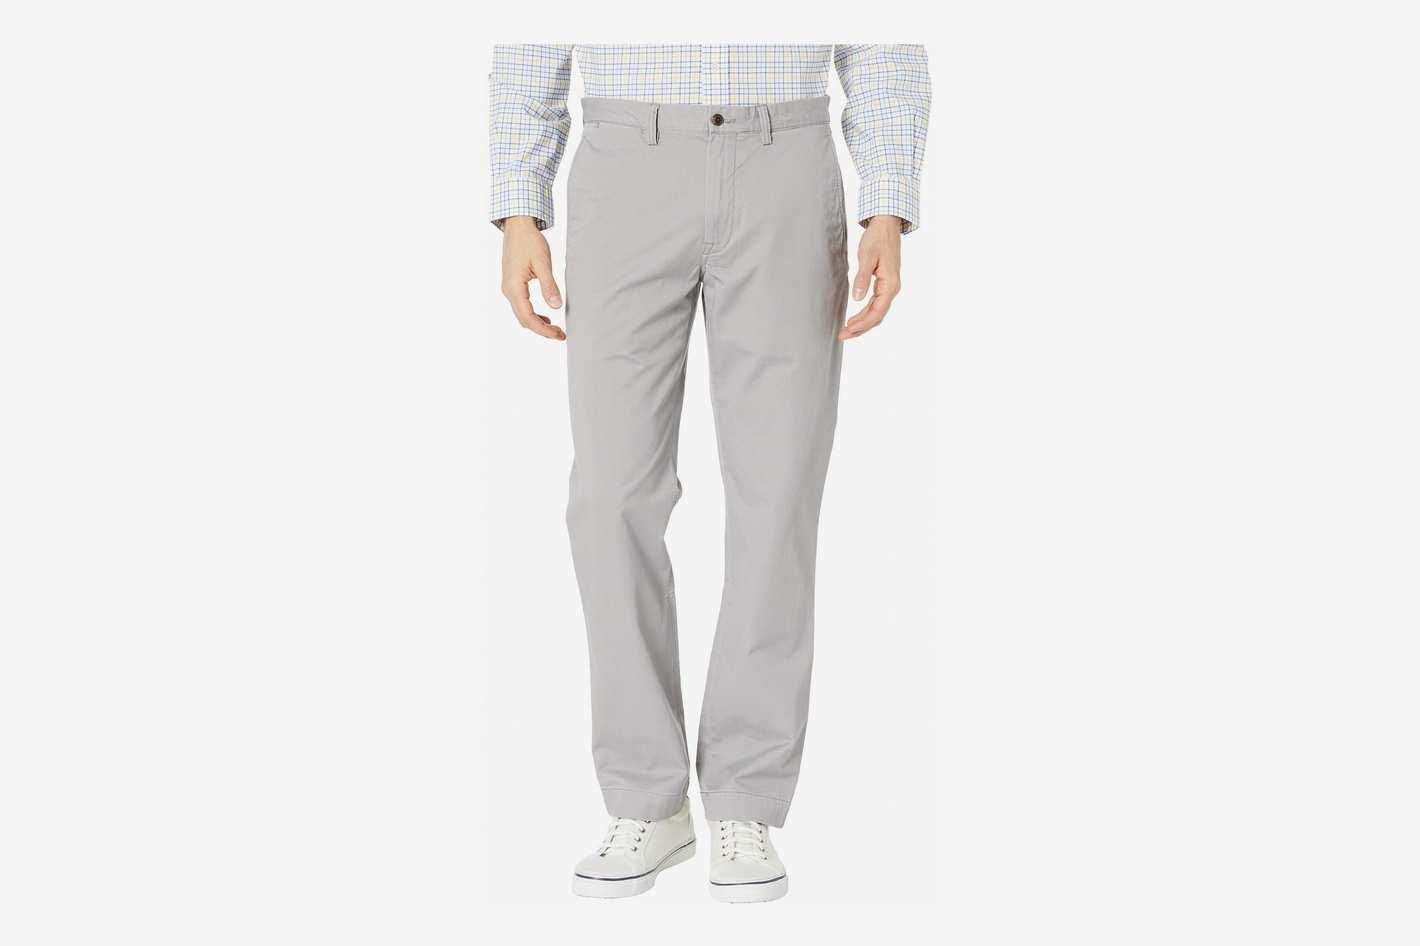 Polo Ralph Lauren Cotton Stretch Twill Bedford Flat Pants